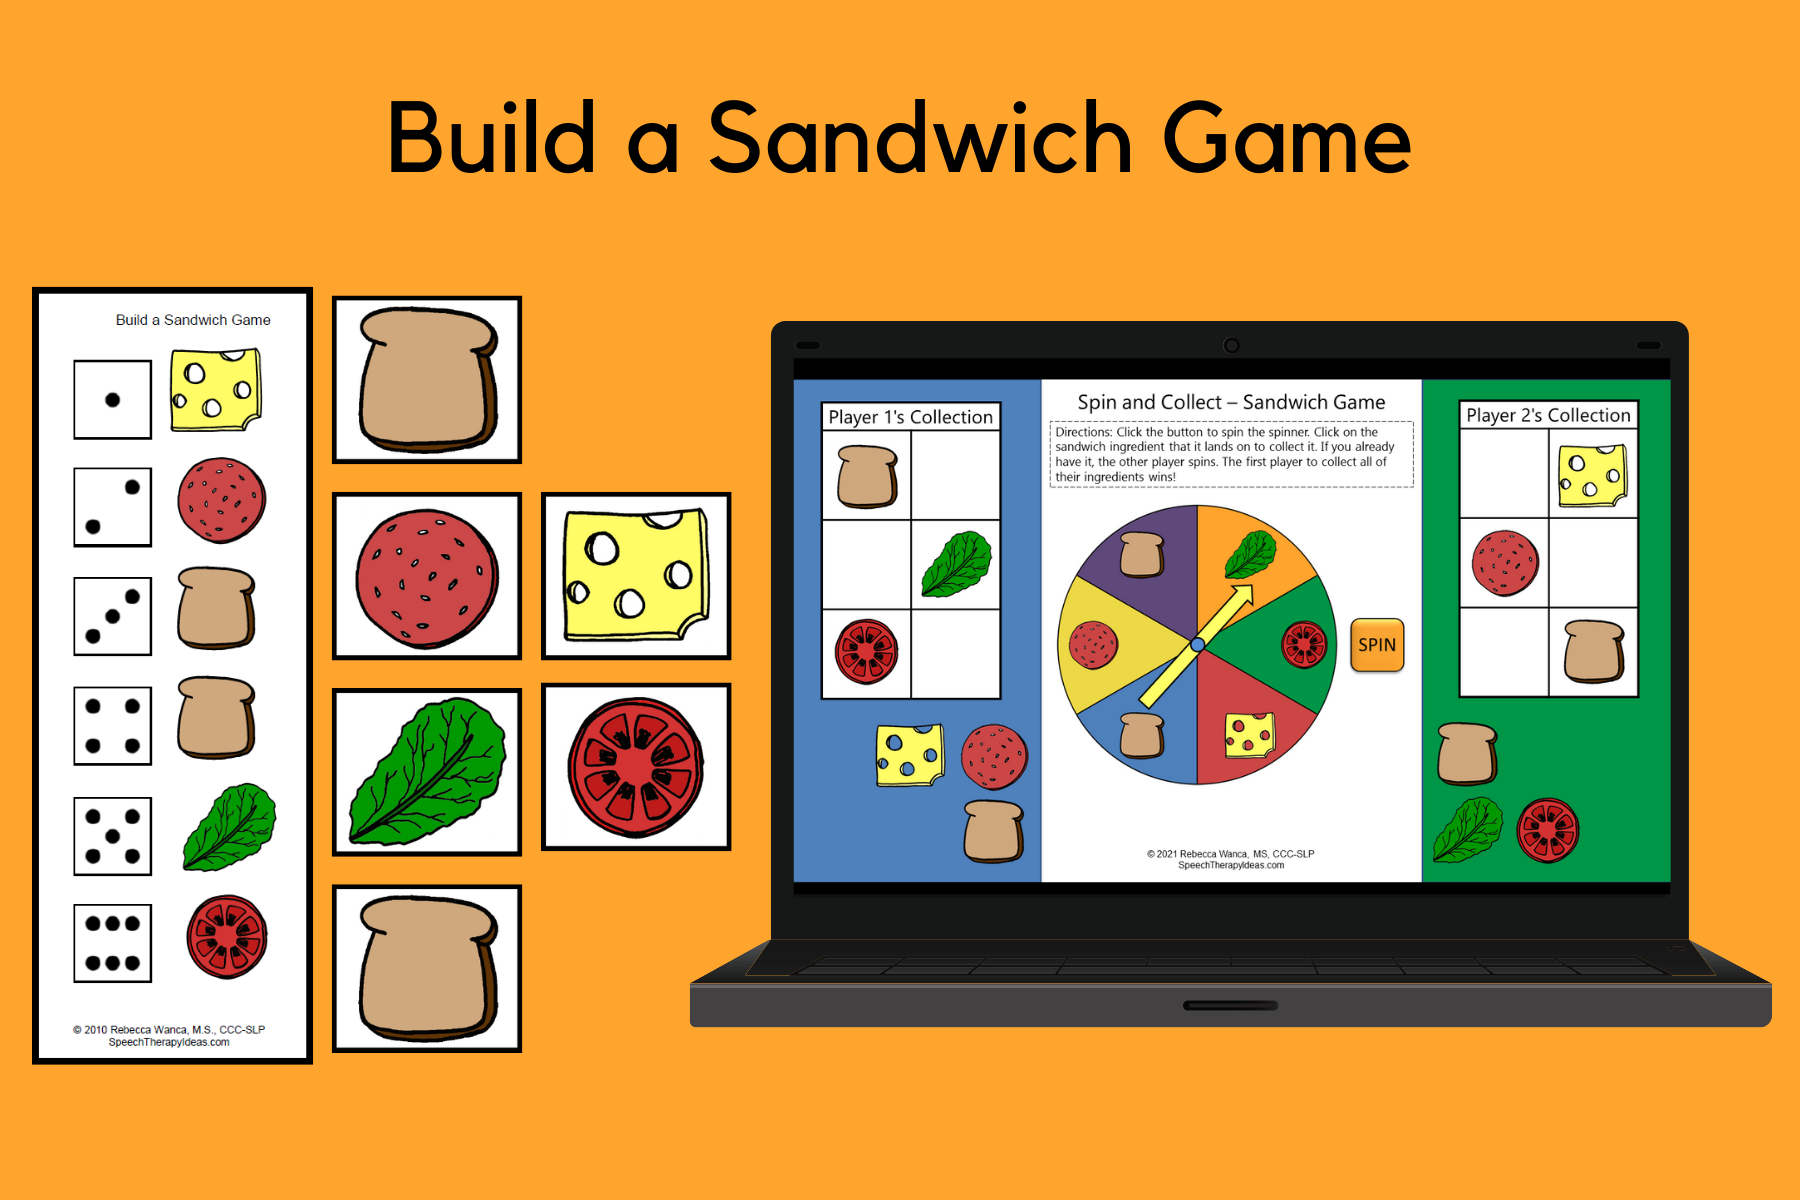 Build a Sandwich Game